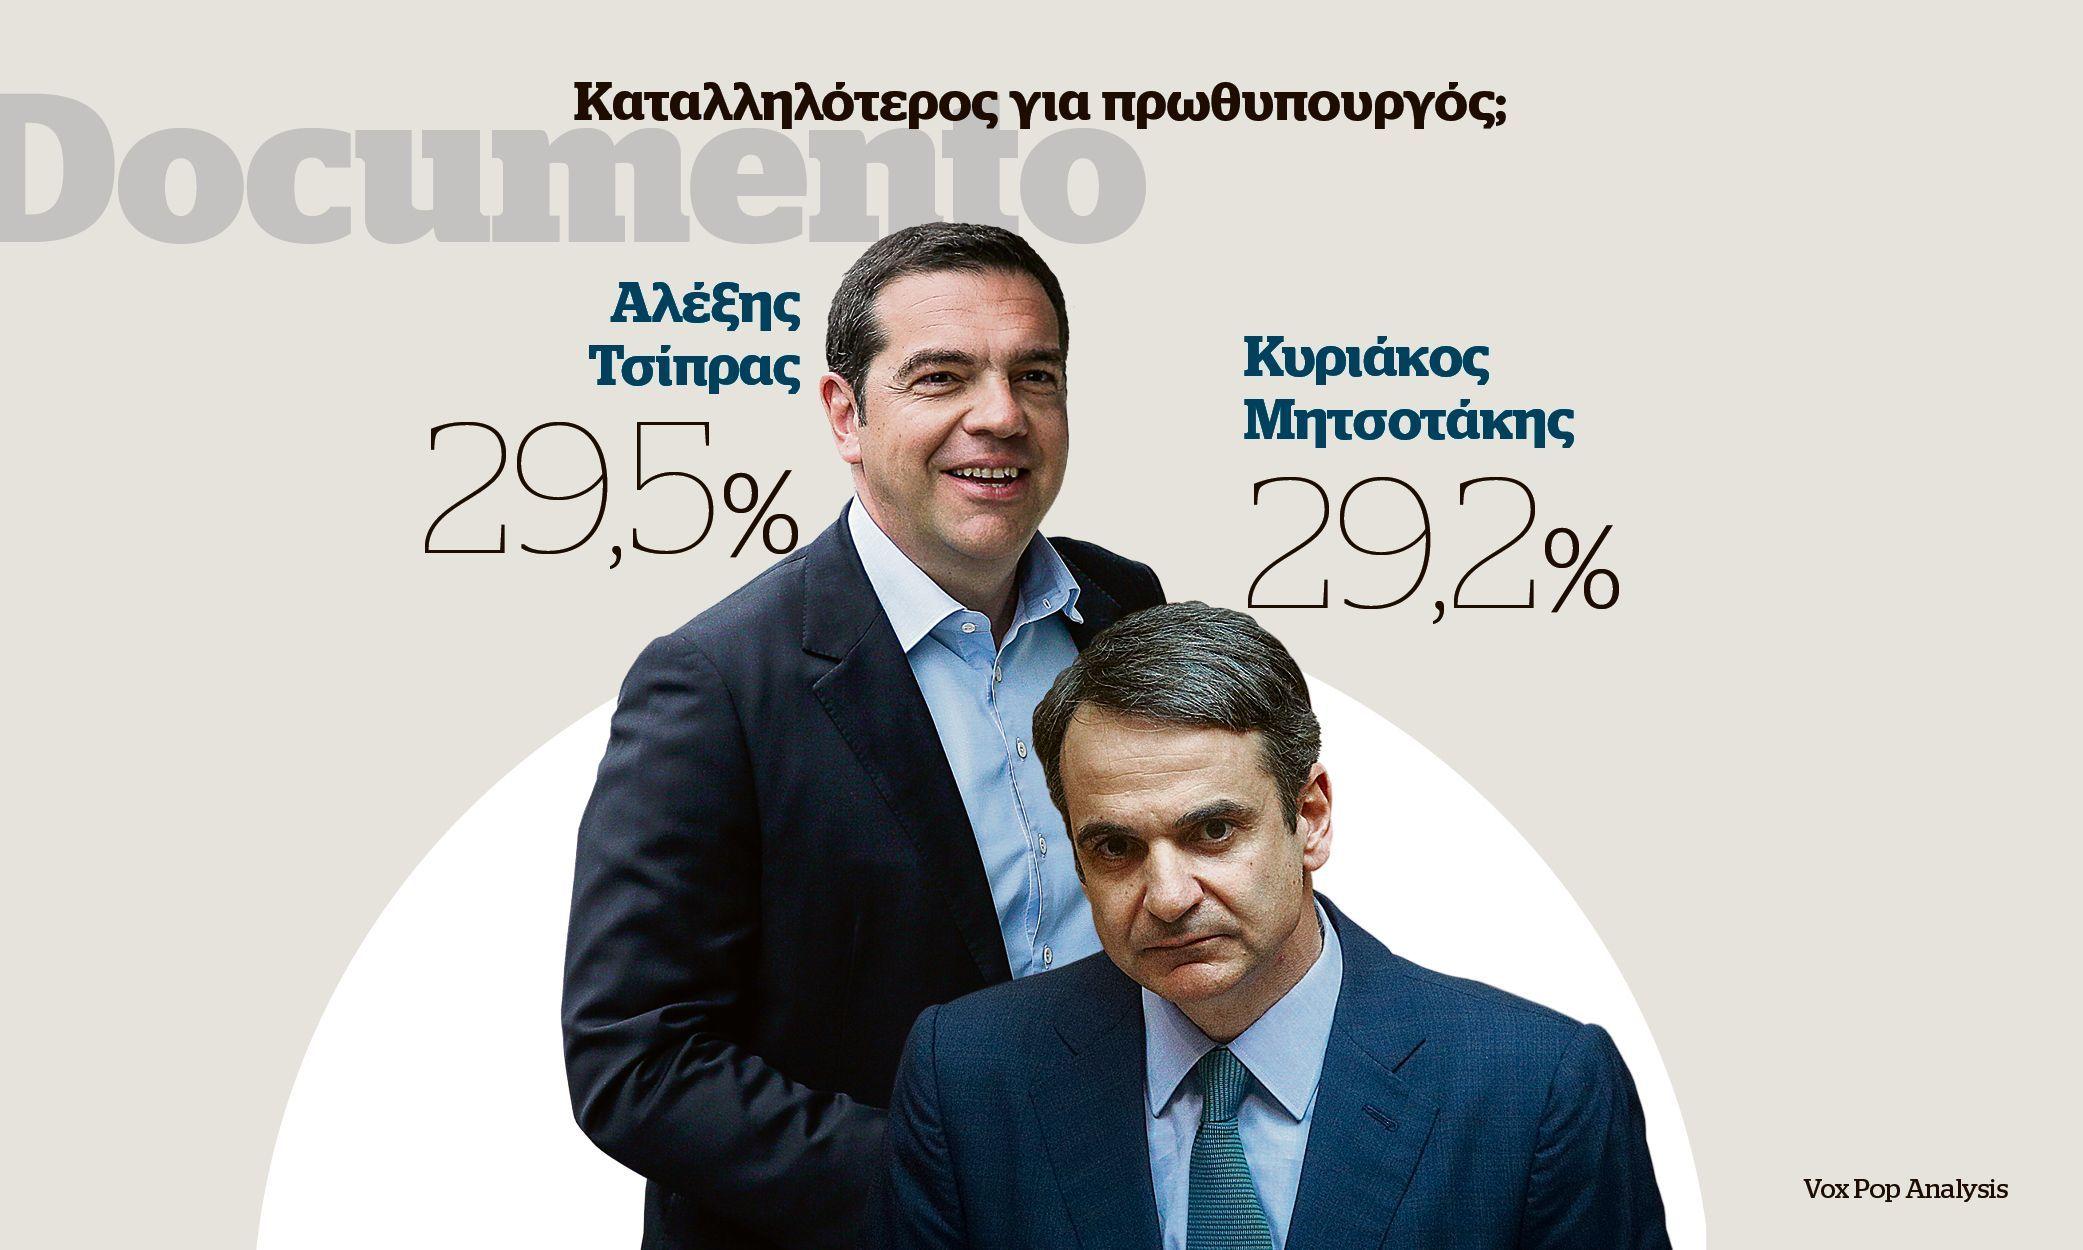 Po novoj anketi Cipras vodi ispred Micotakisa